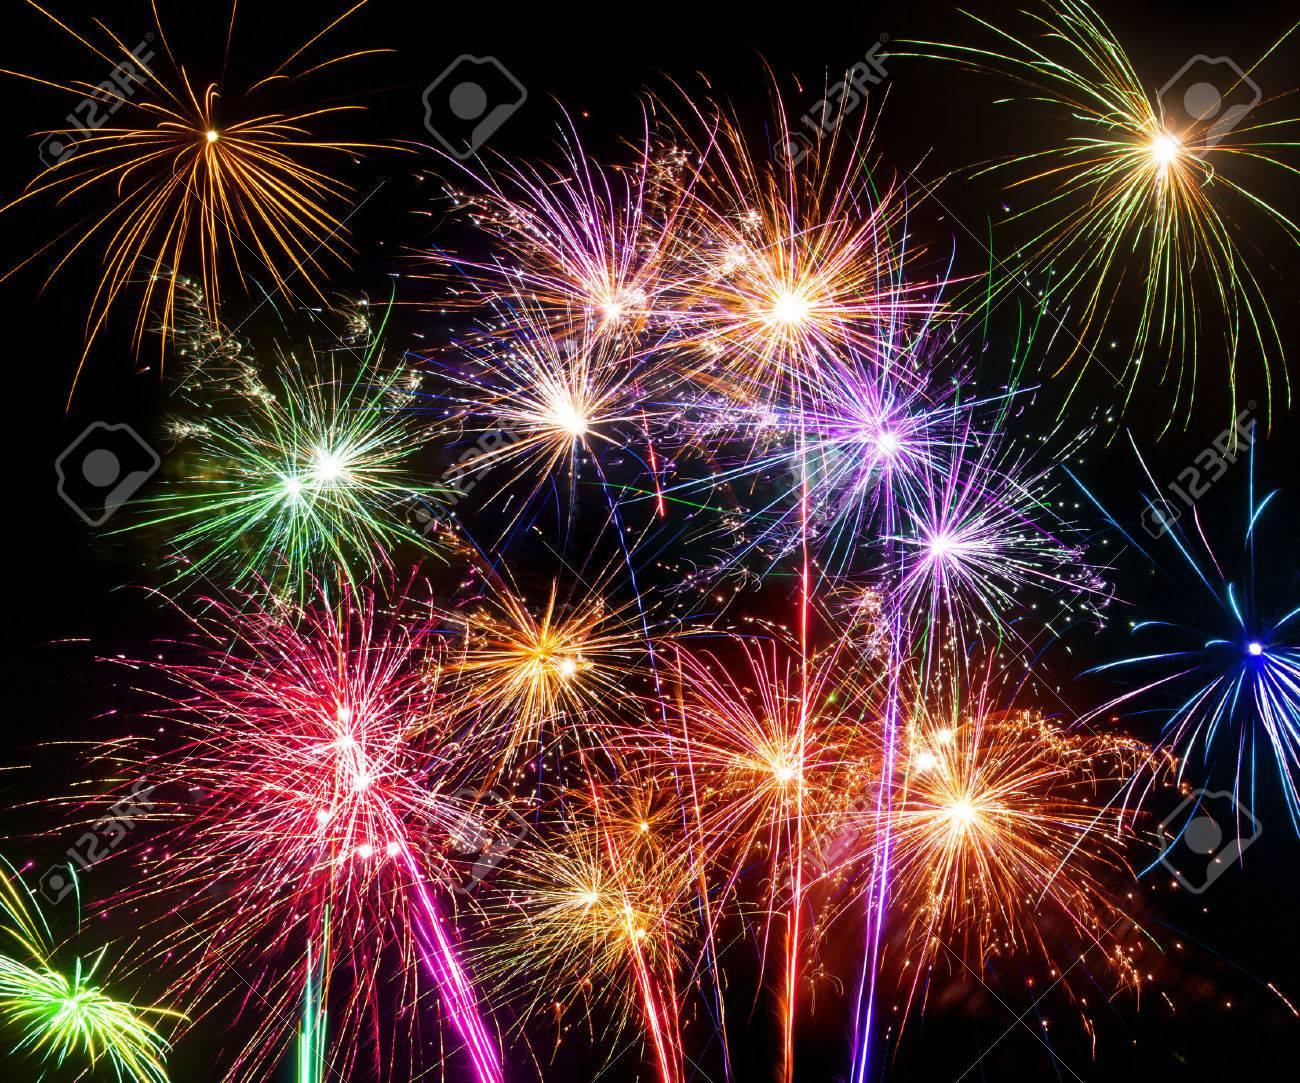 Isolated shots of fireworks blasts on black background - 23955877